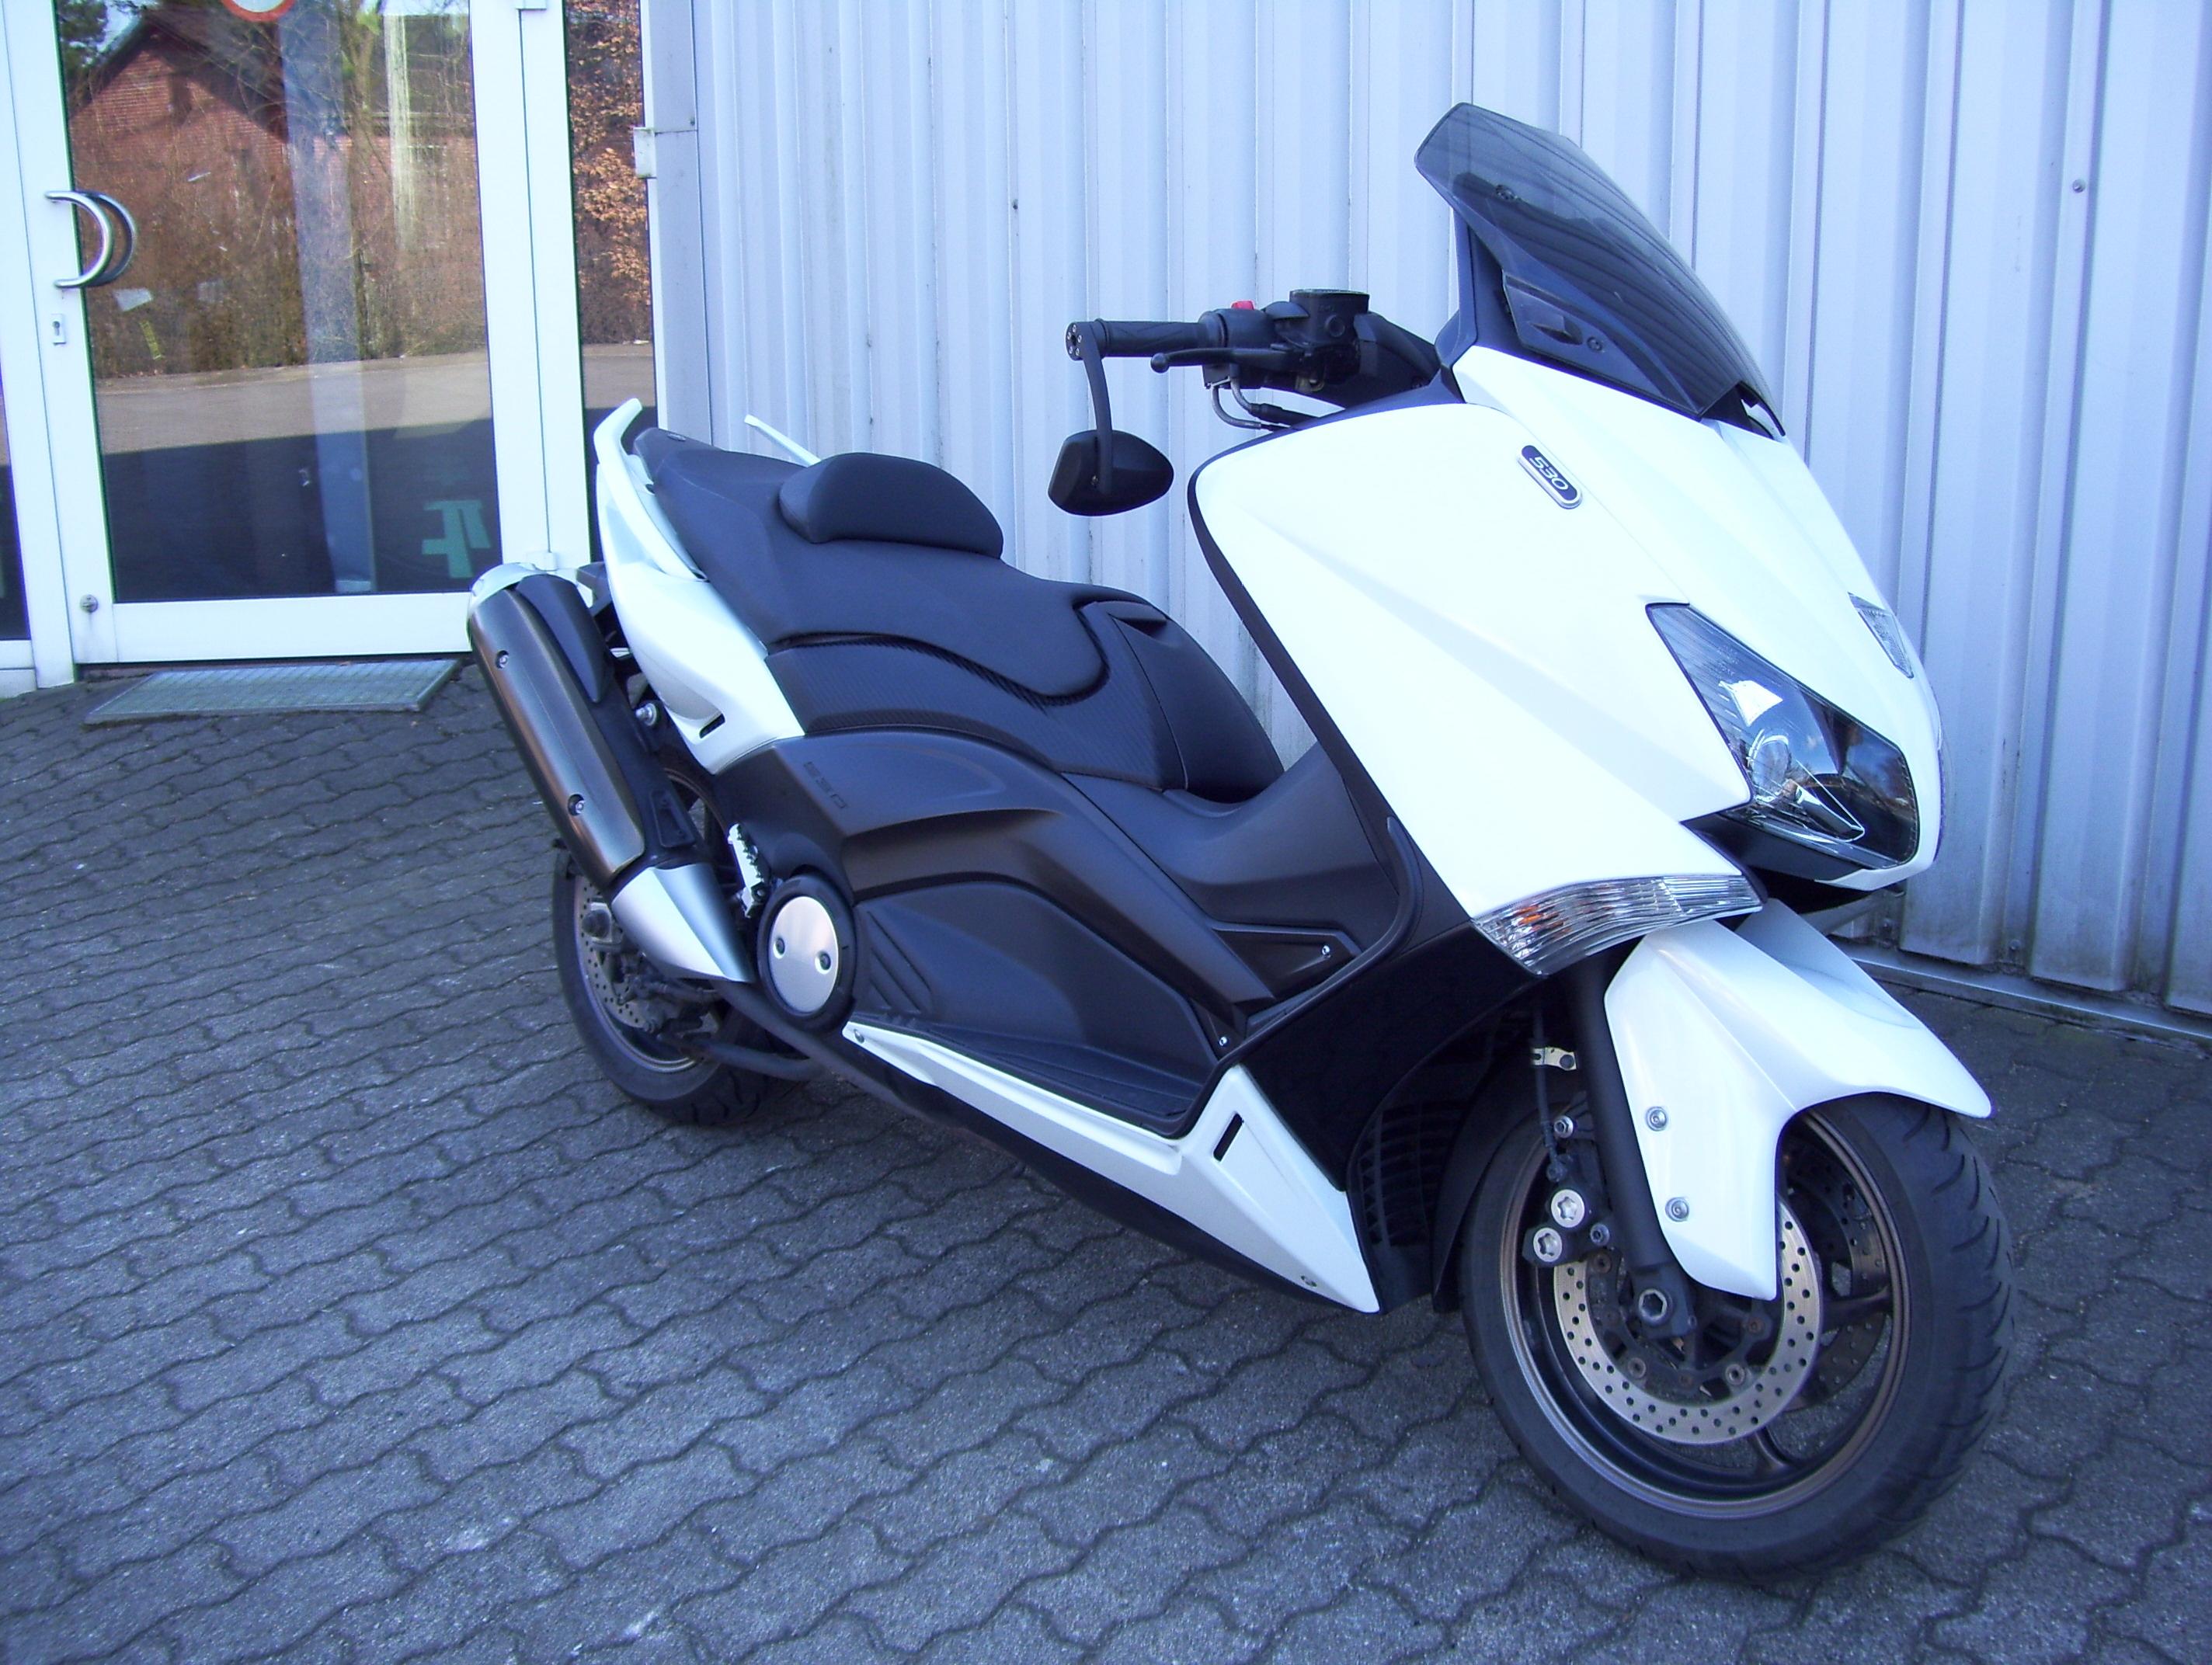 yamaha roller t max 530 wei 2014 bruno 39 s moto company. Black Bedroom Furniture Sets. Home Design Ideas